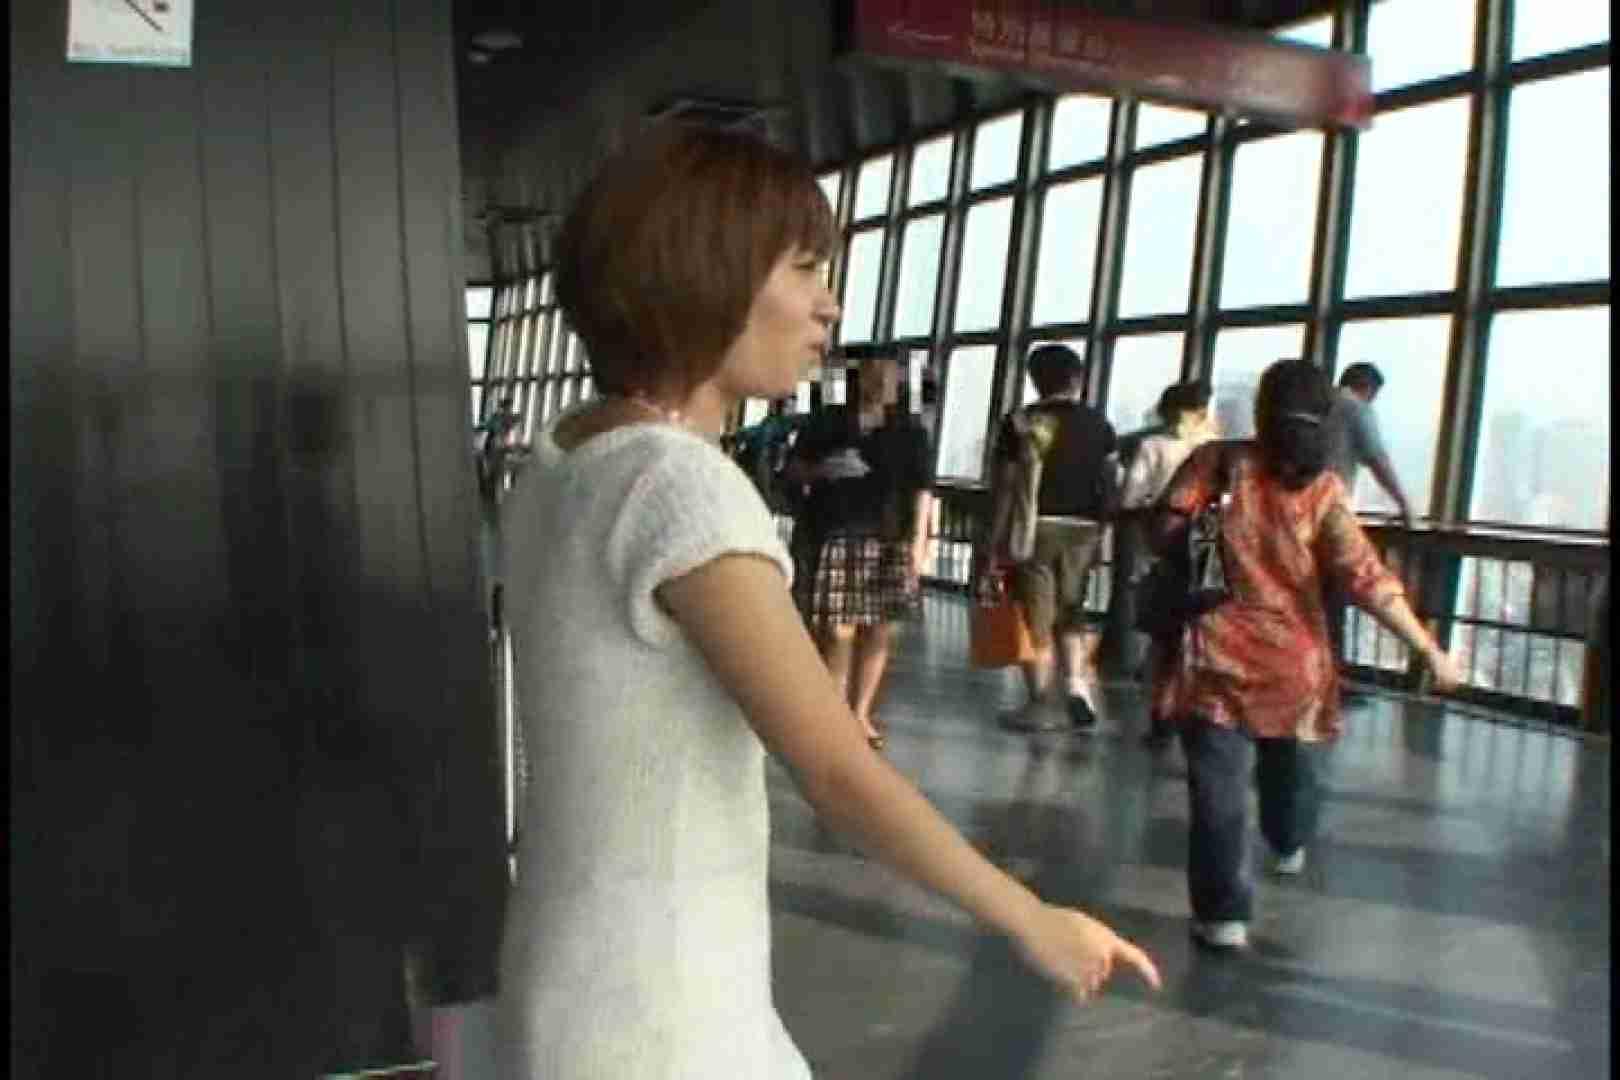 JDハンター全国ツアー vol.026 前編 萌え女子大生   OL女体  74連発 21